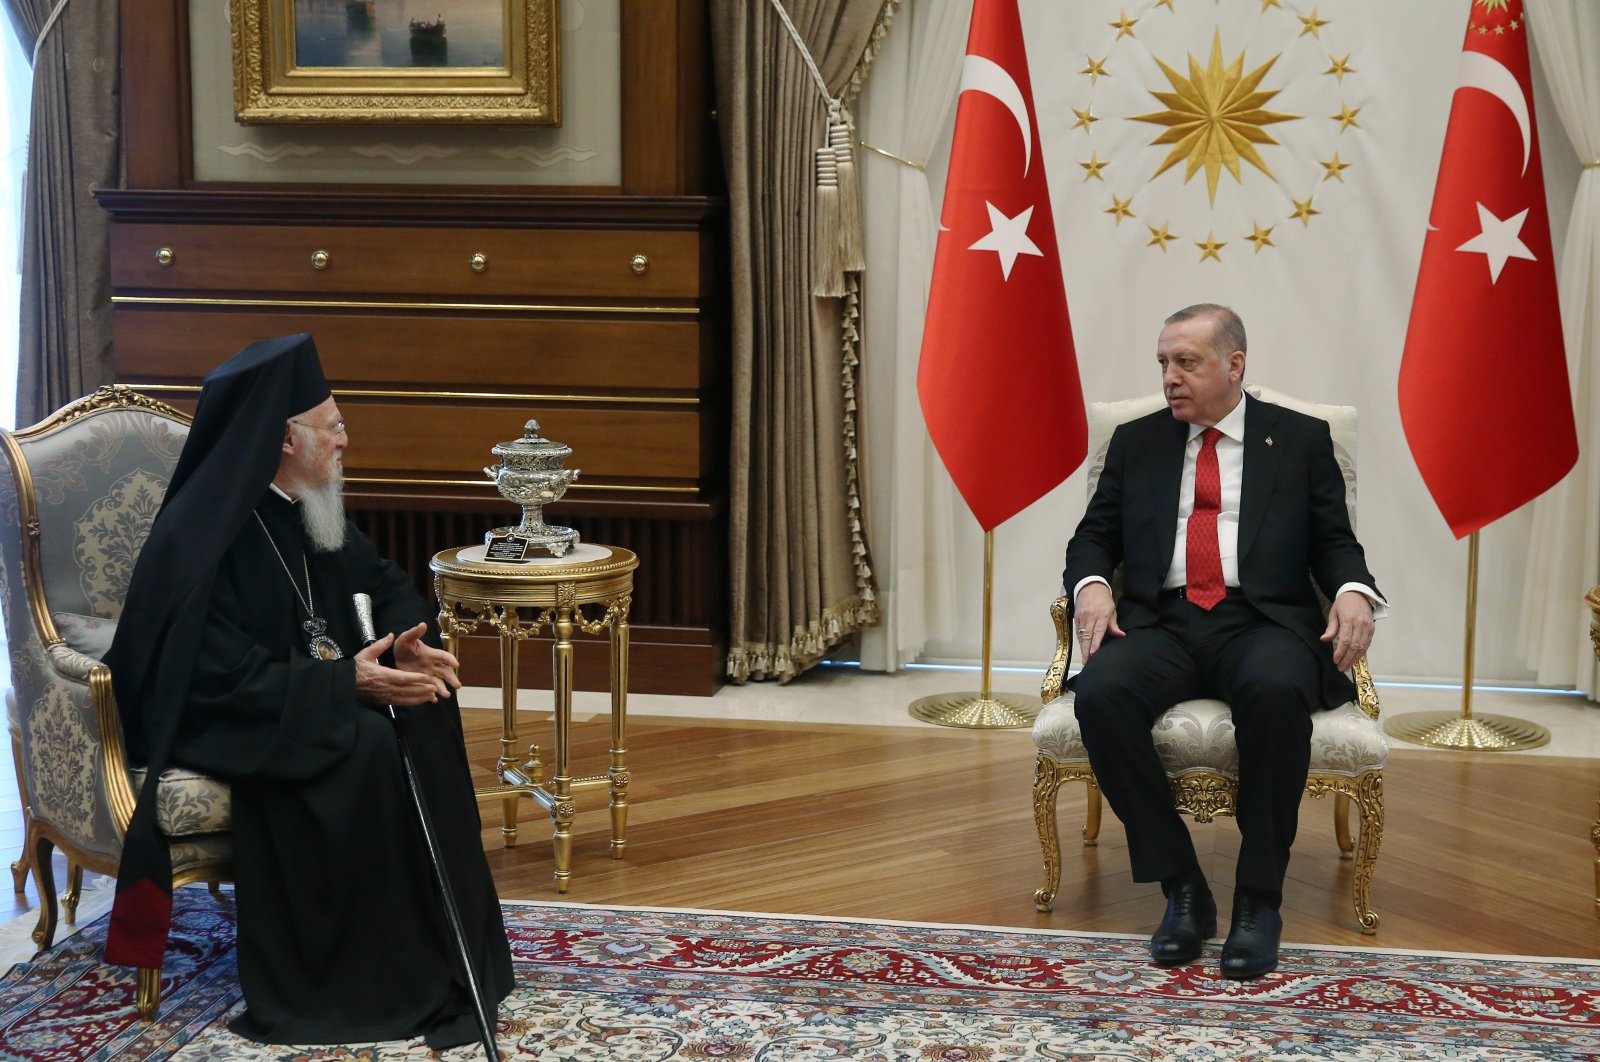 President Recep Tayyip Erdoğan at a meeting with Fener Greek Orthodox Patriarch Bartholomew, in Ankara, Turkey, Thursday, April 26, 2018. (DHA Photo)